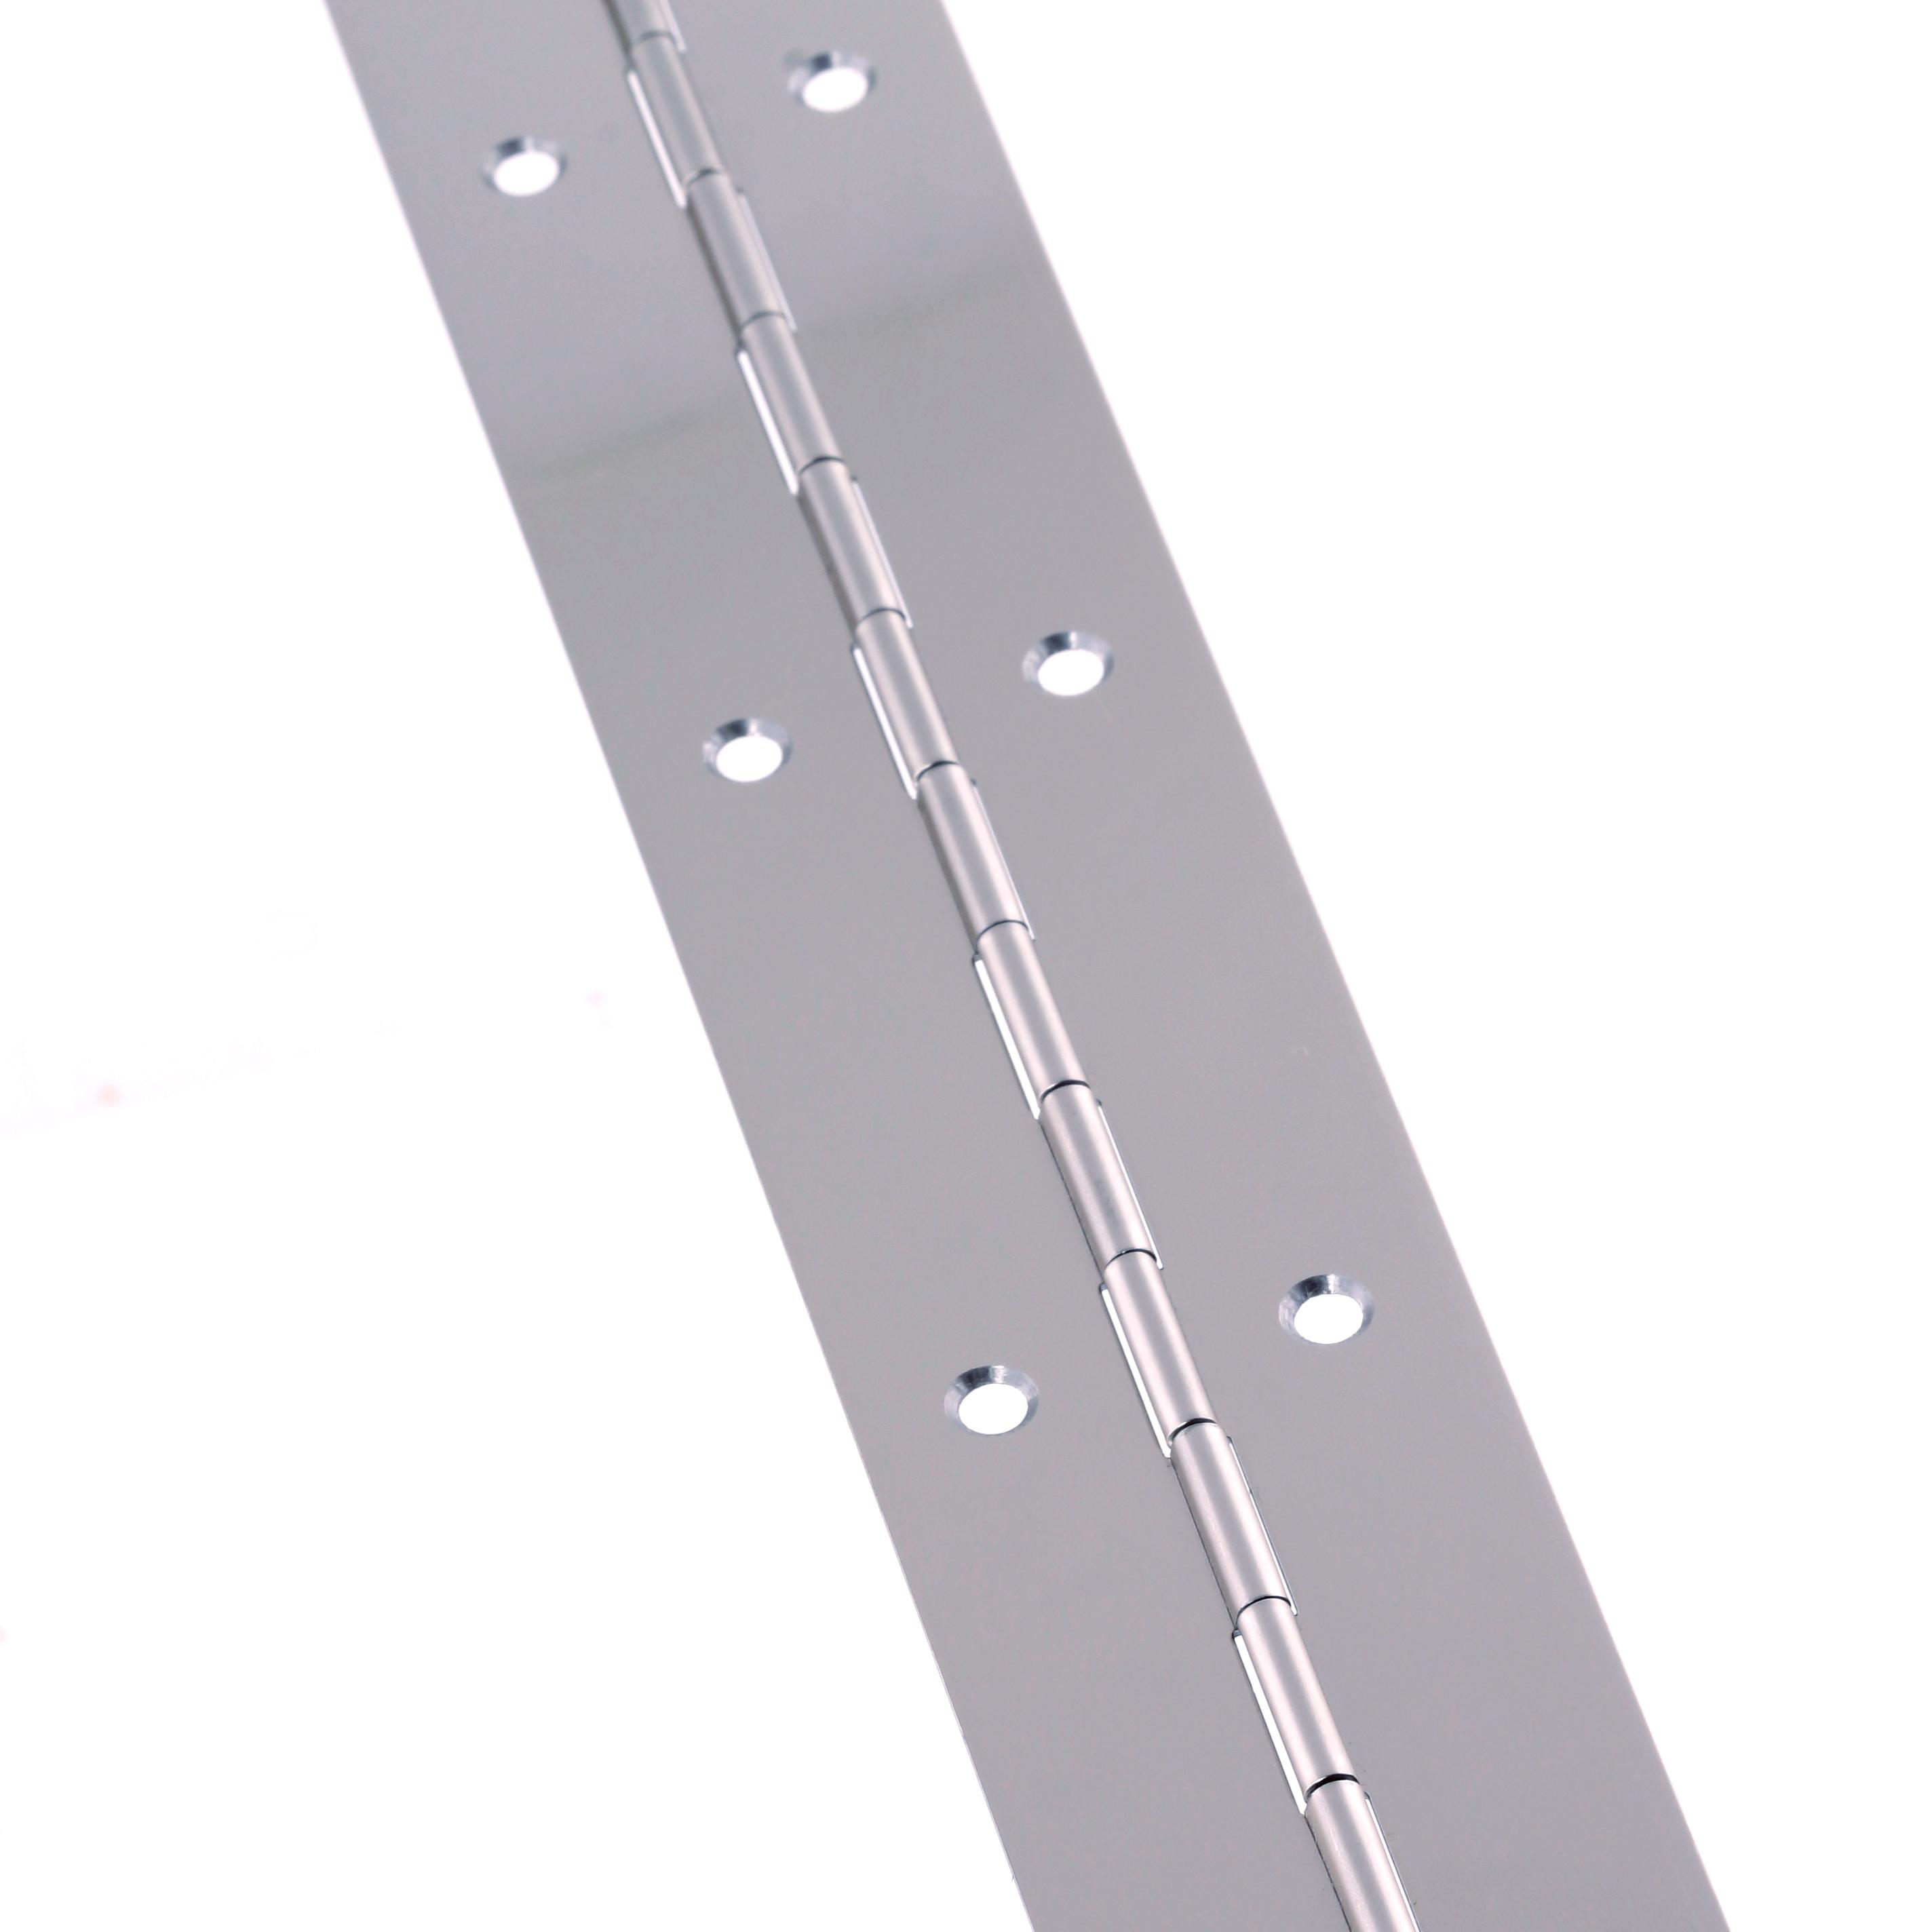 Steel Piano Hinge - 1850 x 38 x 0.7mm - Nickel Plated)